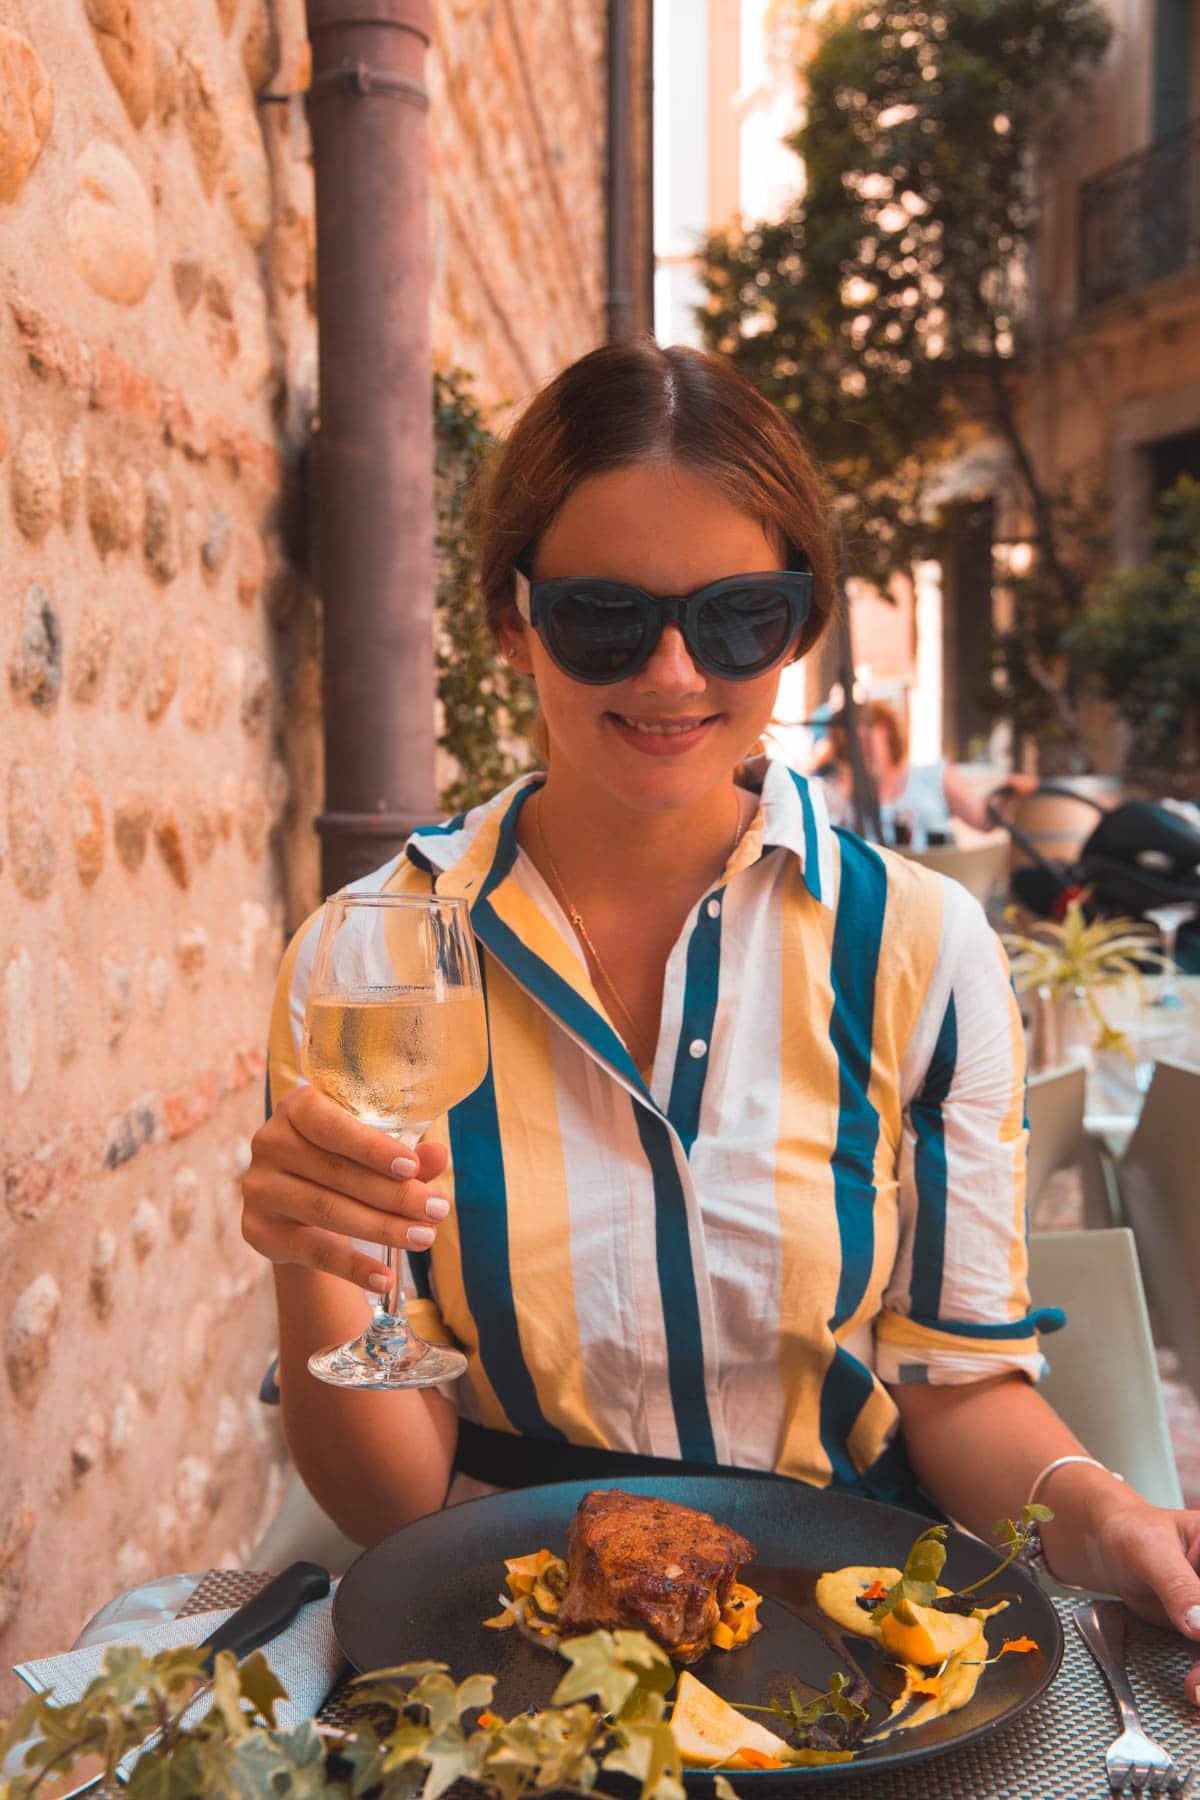 Perpignan - Top 5 Ausflugsziele im Roussillon in Südfrankreich